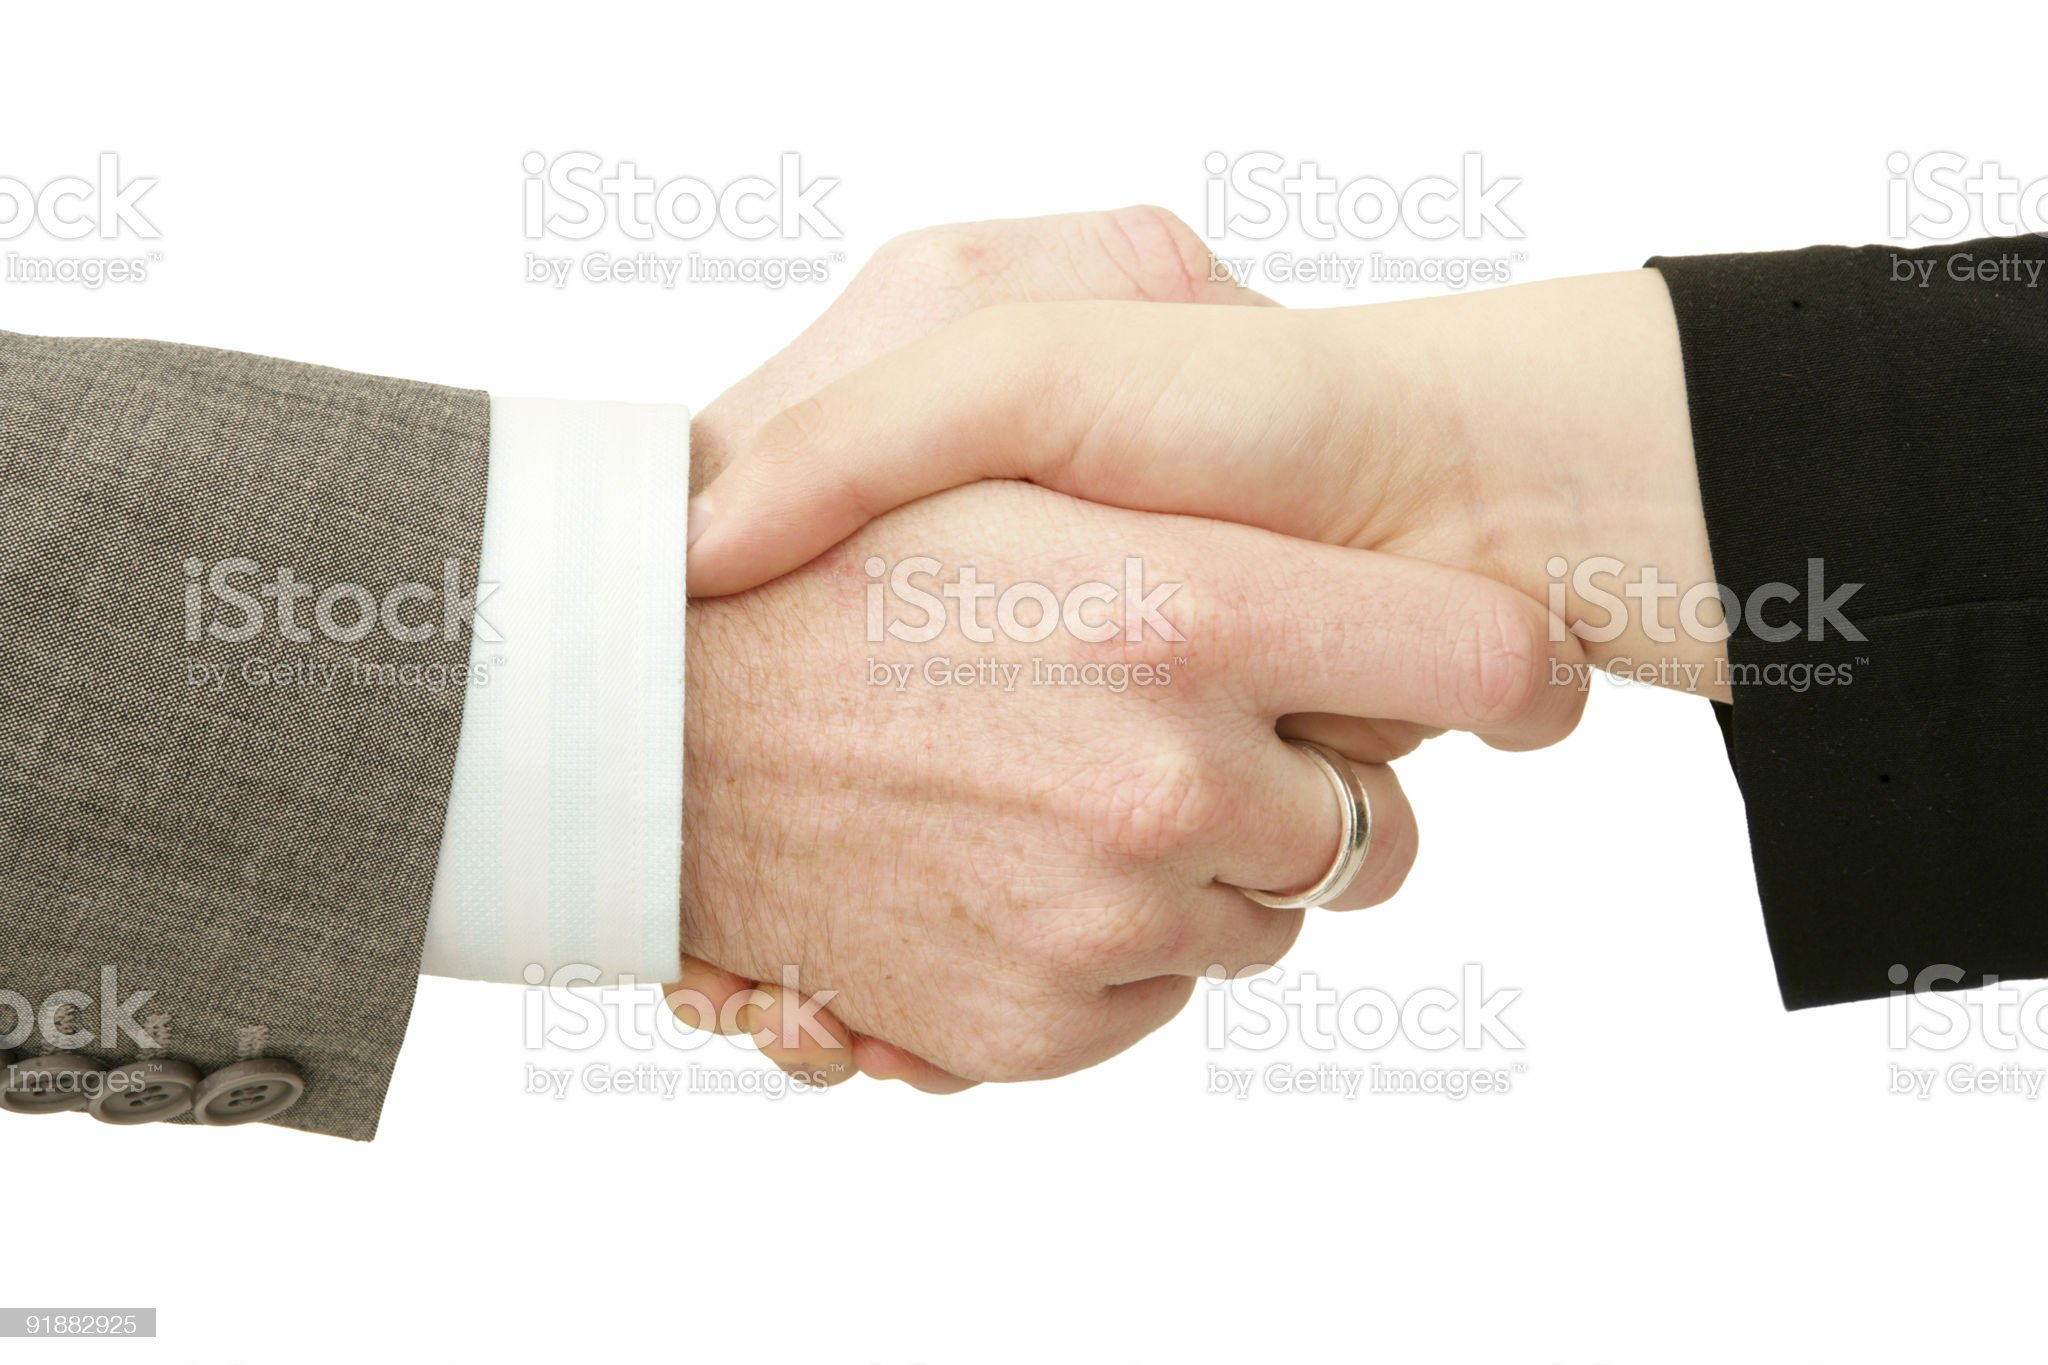 Deal Handshake royalty-free stock photo